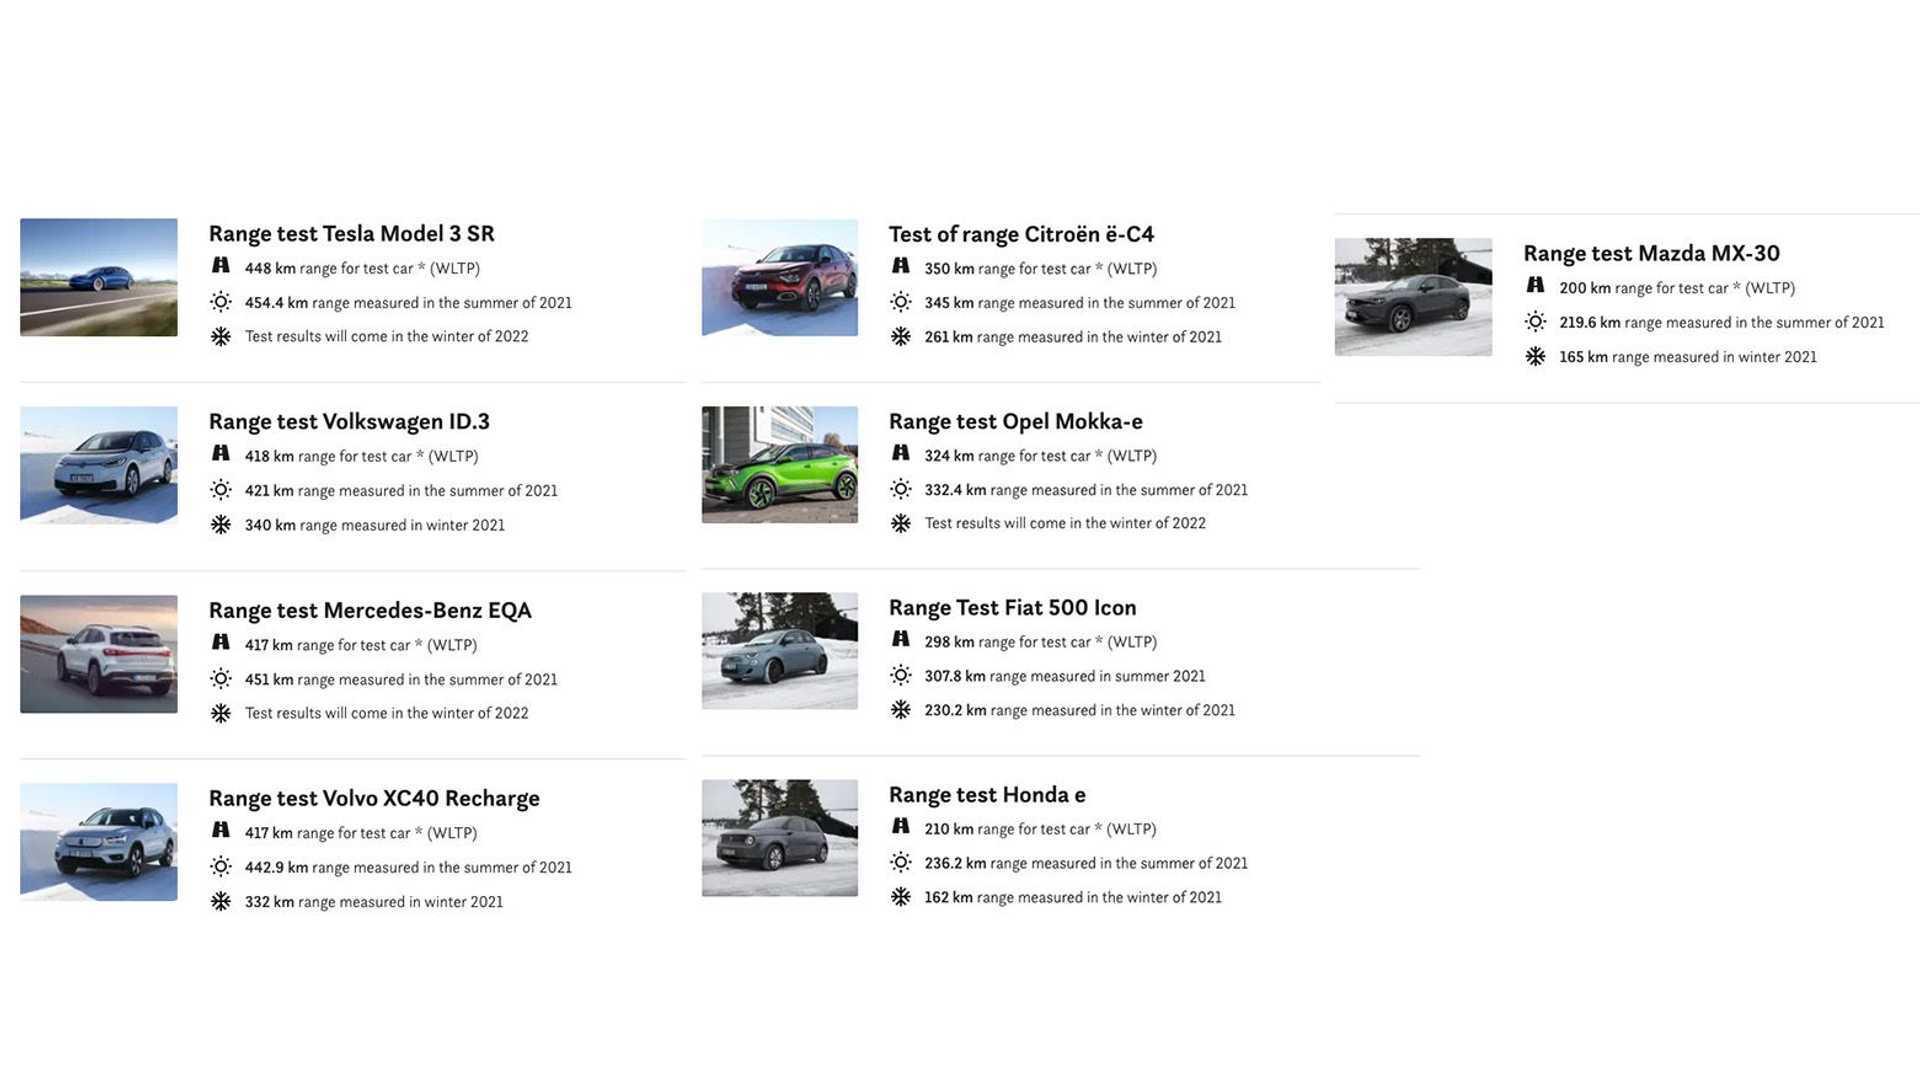 https://cdn.motor1.com/images/mgl/POln4/s6/naf-summer-electric-vehicle-range-test.jpg